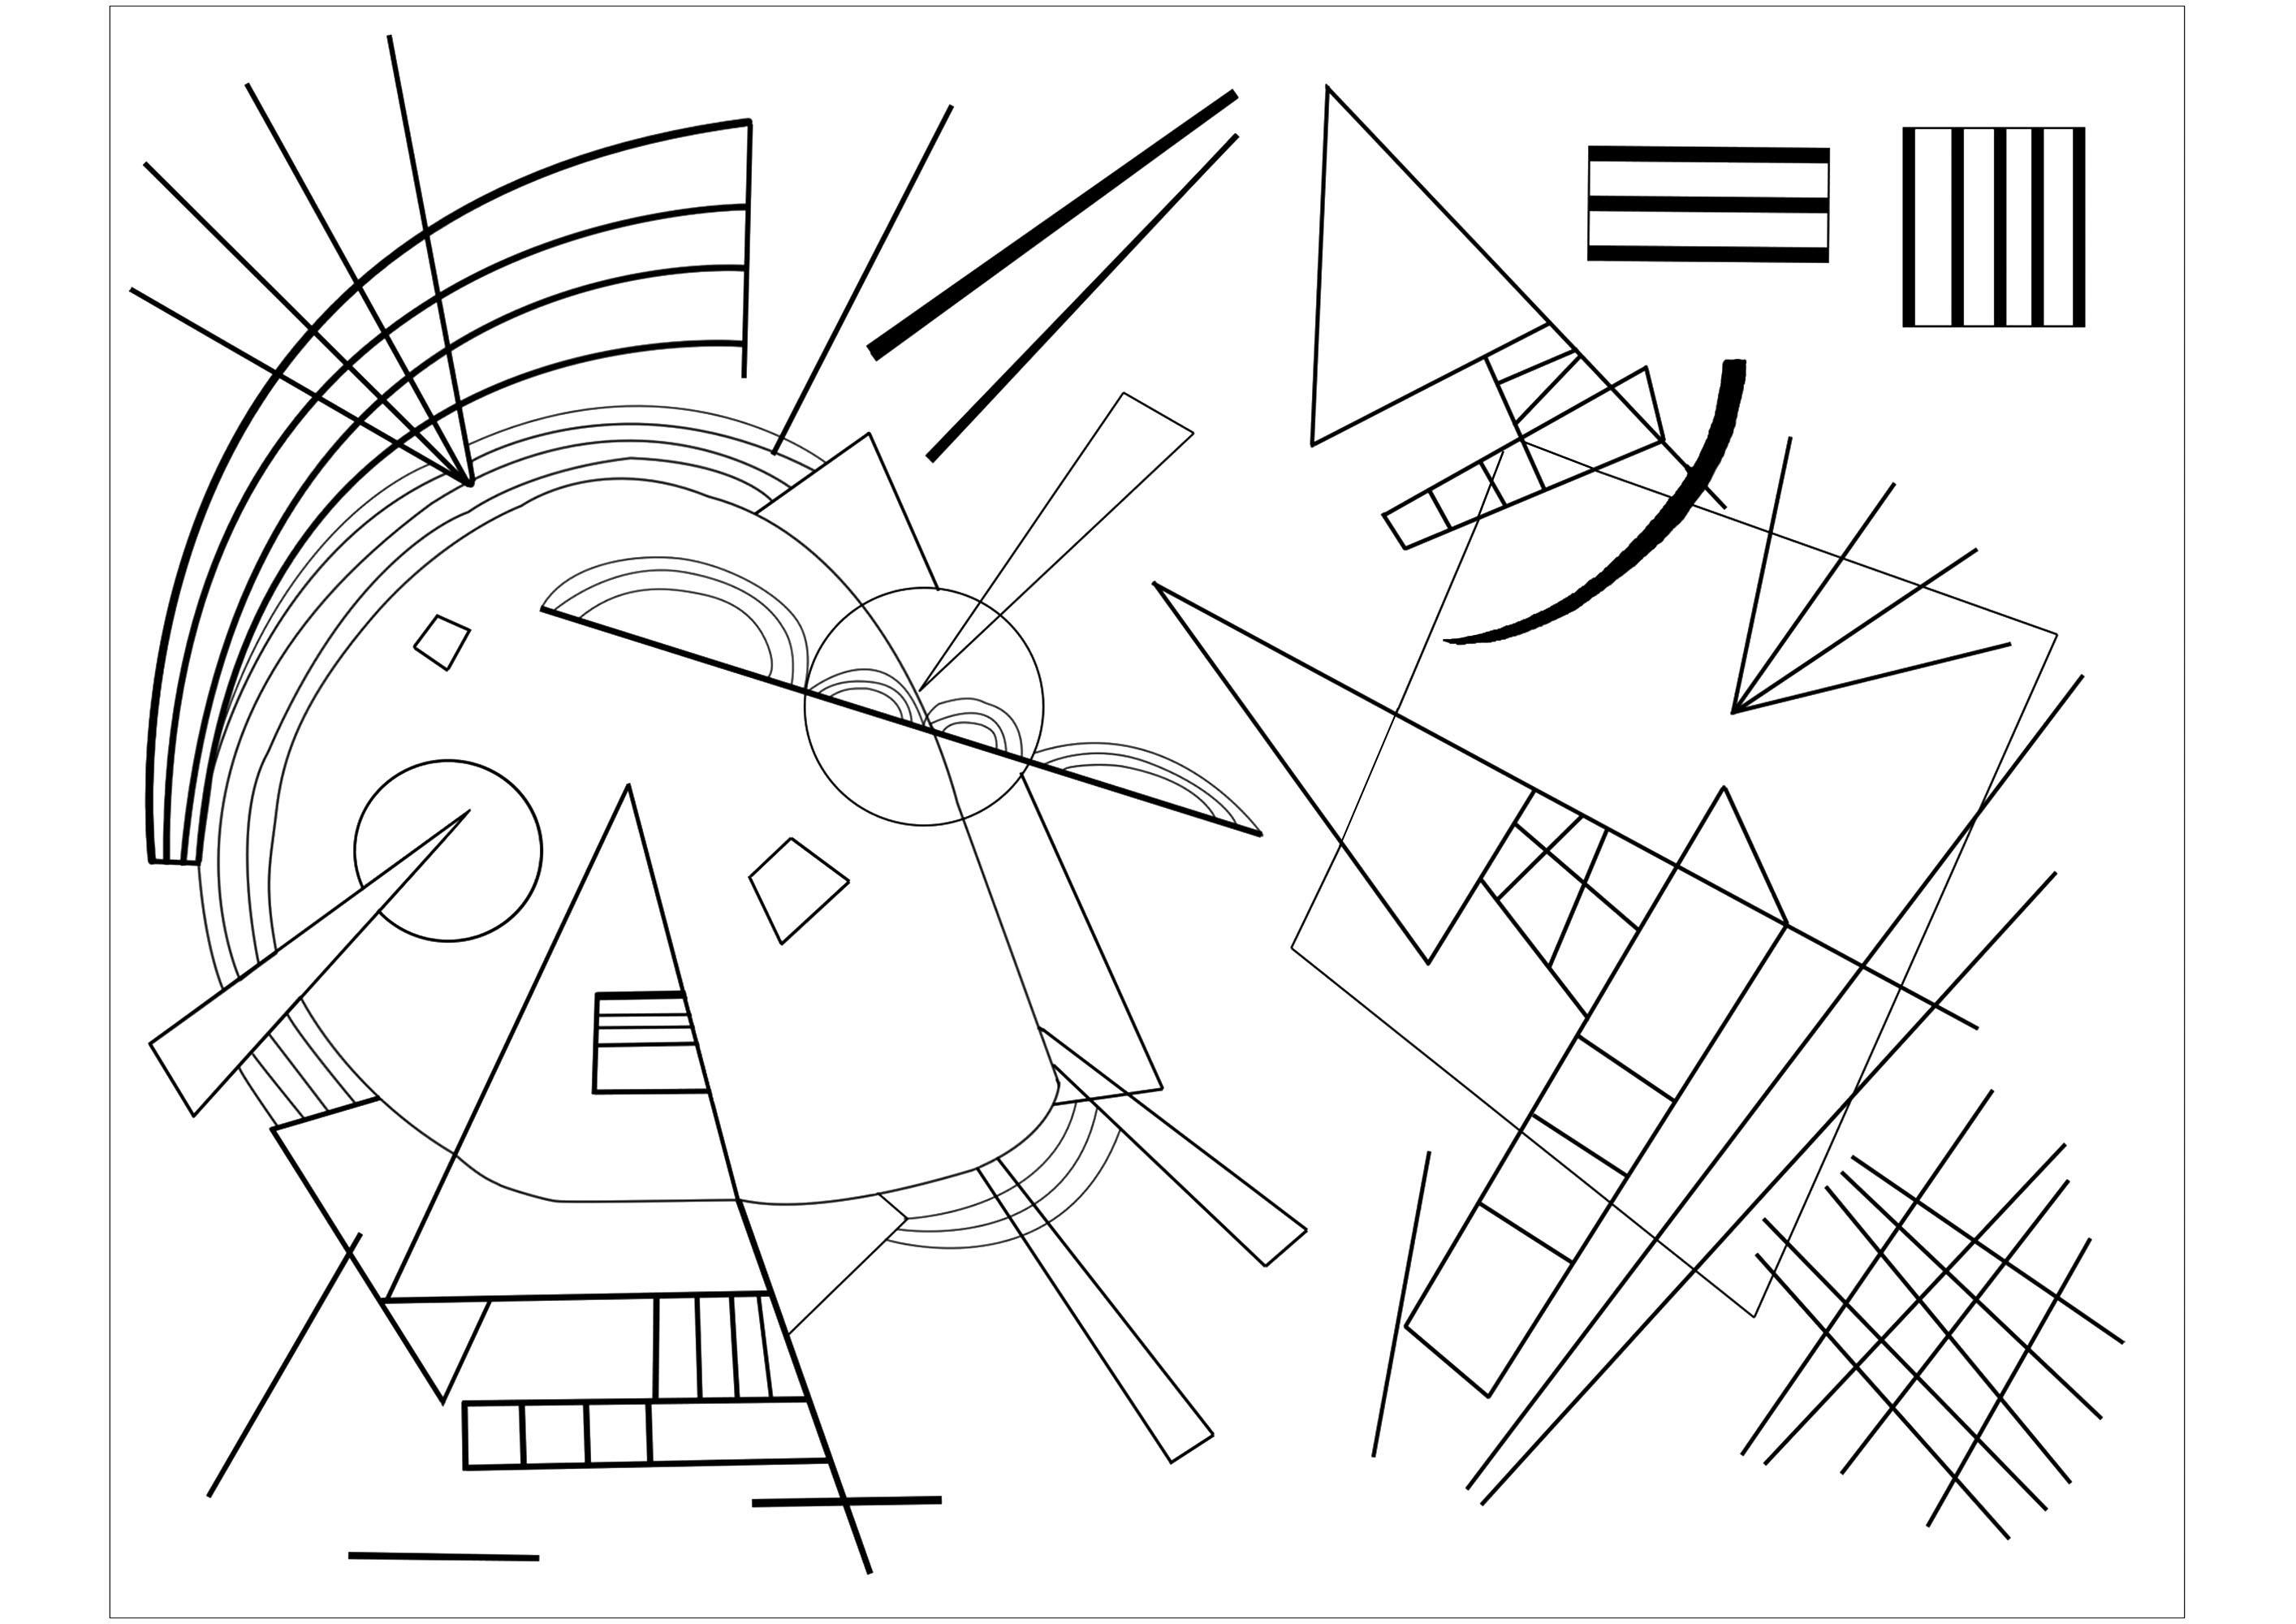 Malbuch Fur Erwachsene : Kunstwerk - 1 - Dieses Bild enthält : Vassily Kandinsky